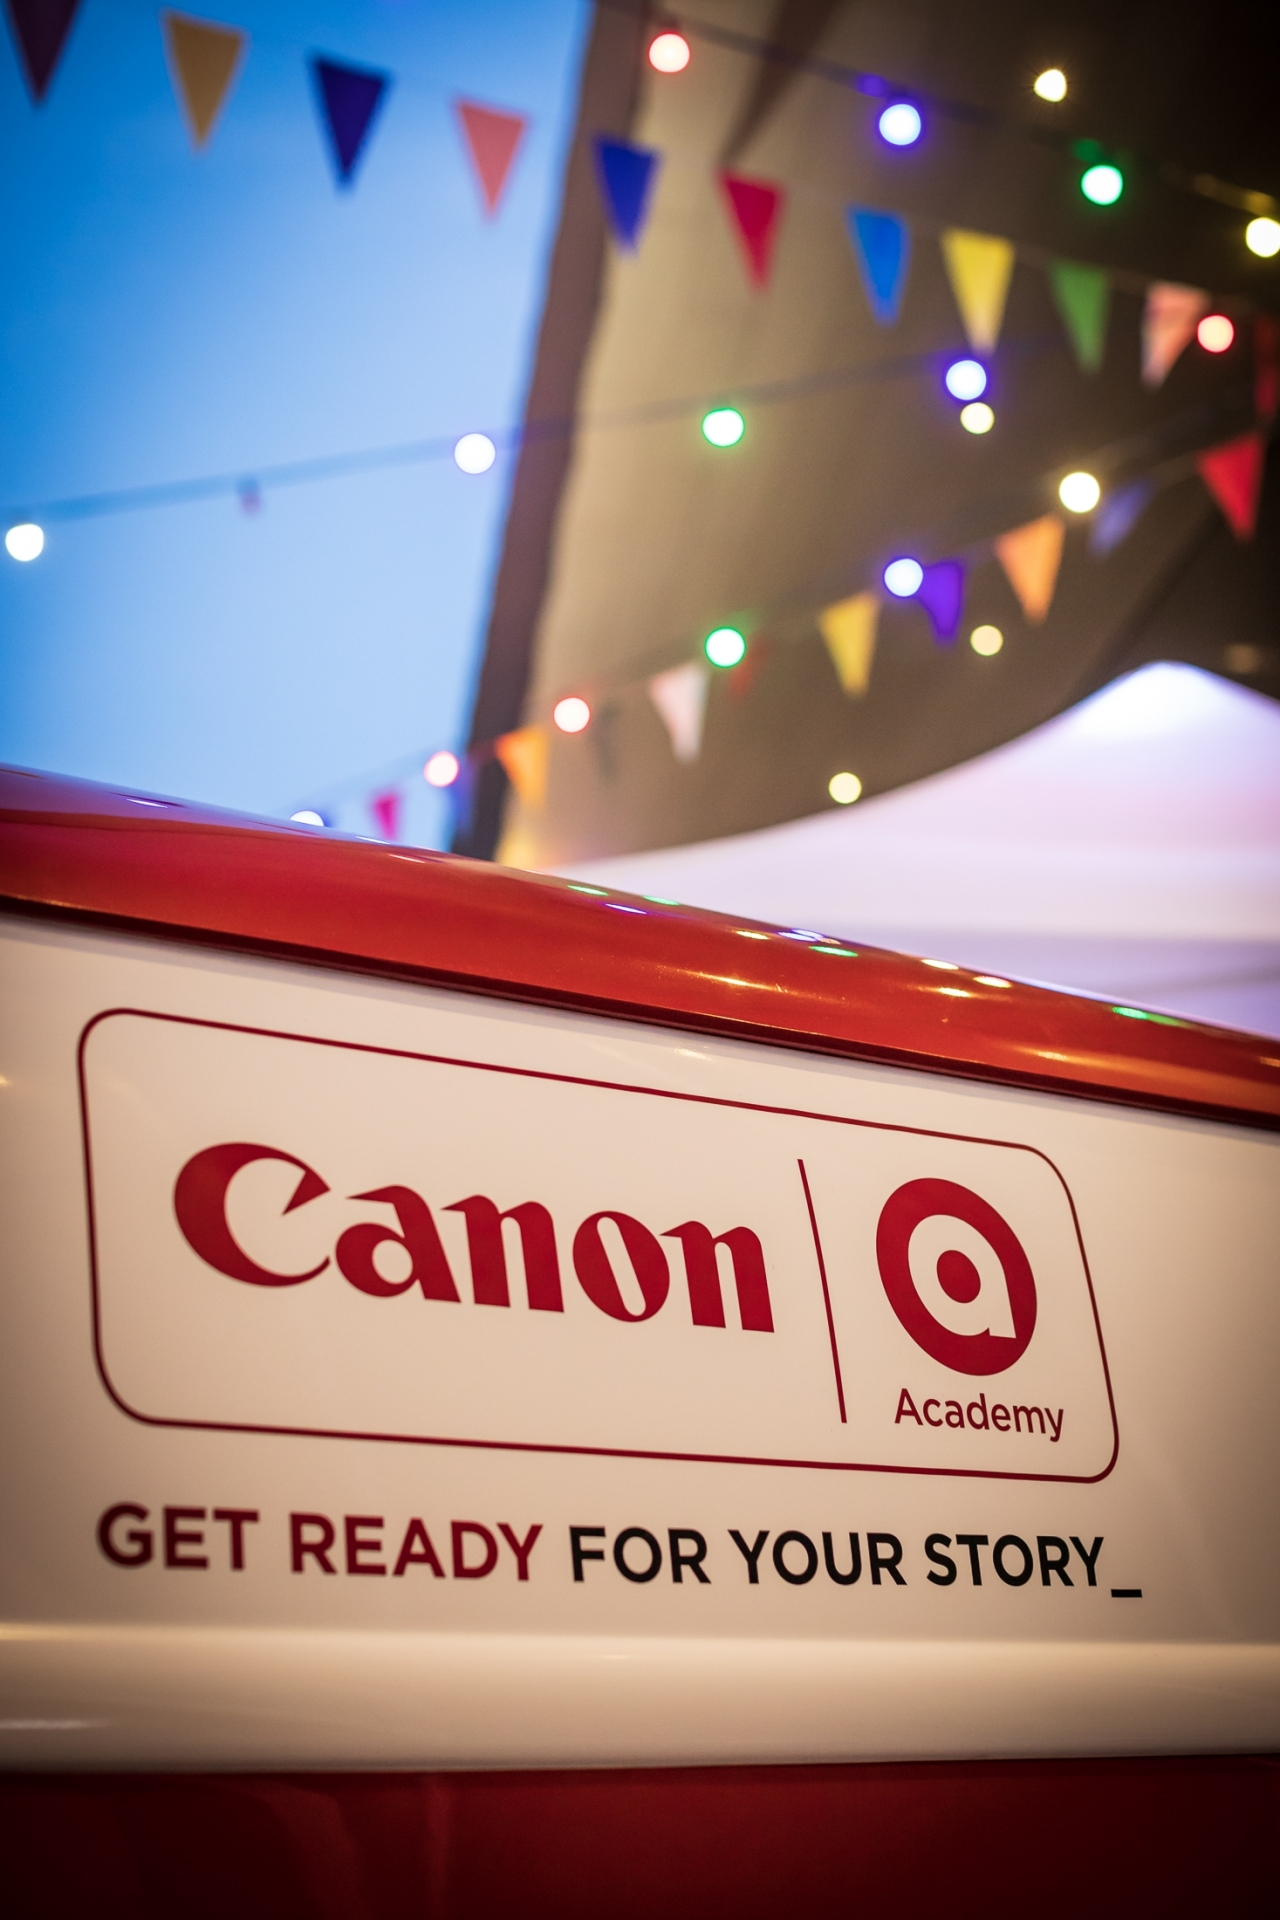 Canon Academy beim Streetfood Festival Bern - Canon Academy Spezialthemen